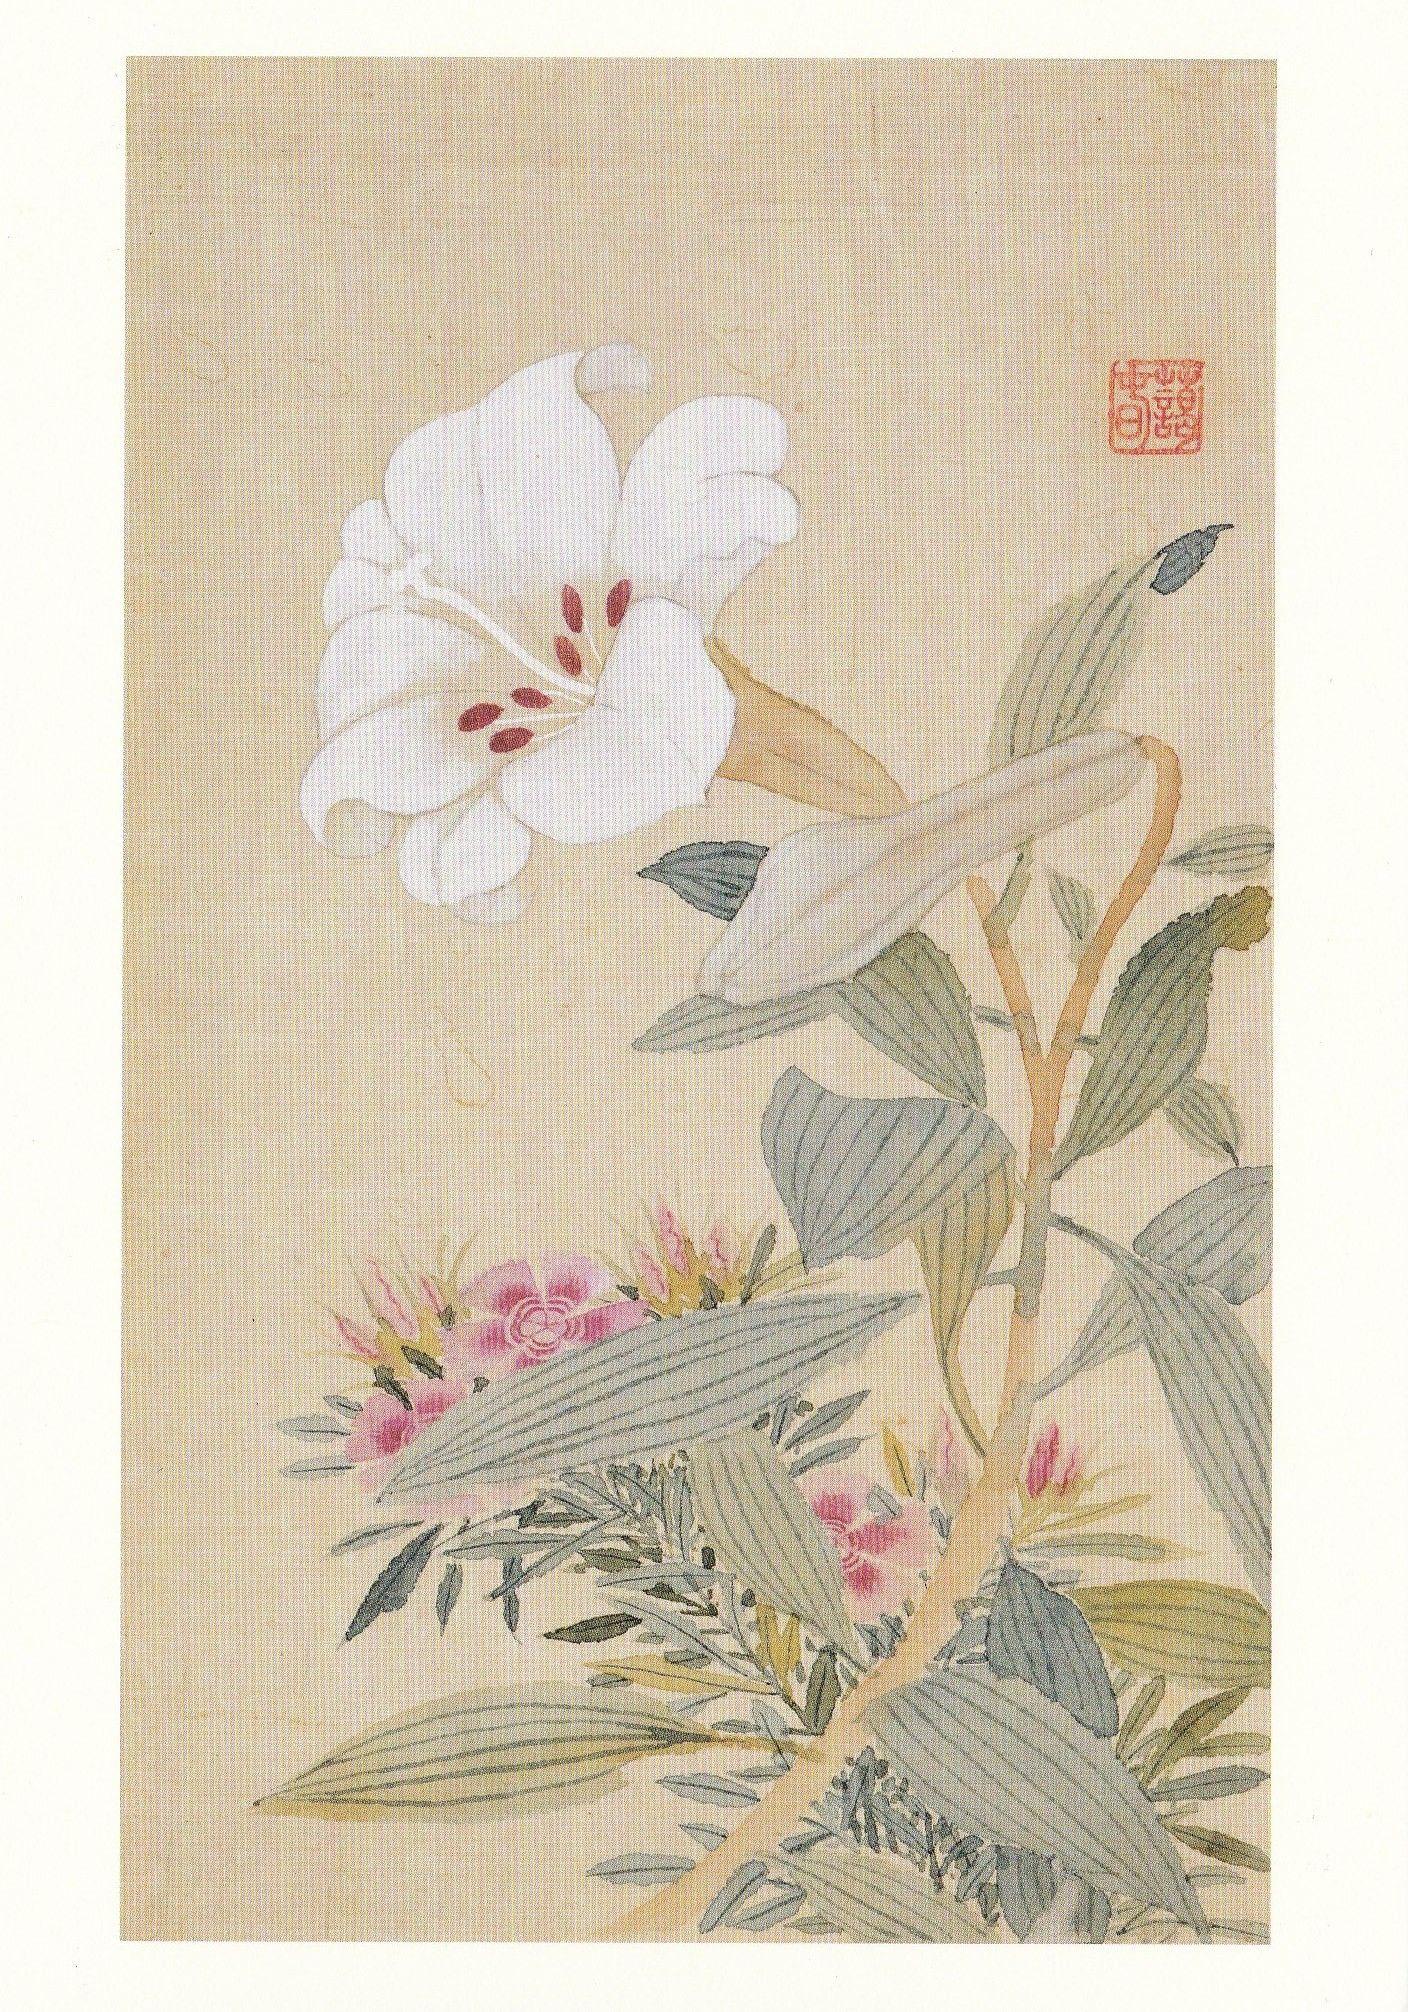 Sin Myeong-yeon (1809-86), Flower painting, Joseon19c, Light Color on Silk, National Museum of Korea. 신명연, 화훼화, 조선19c, 비단에 옅은 색, 국립중앙박물관